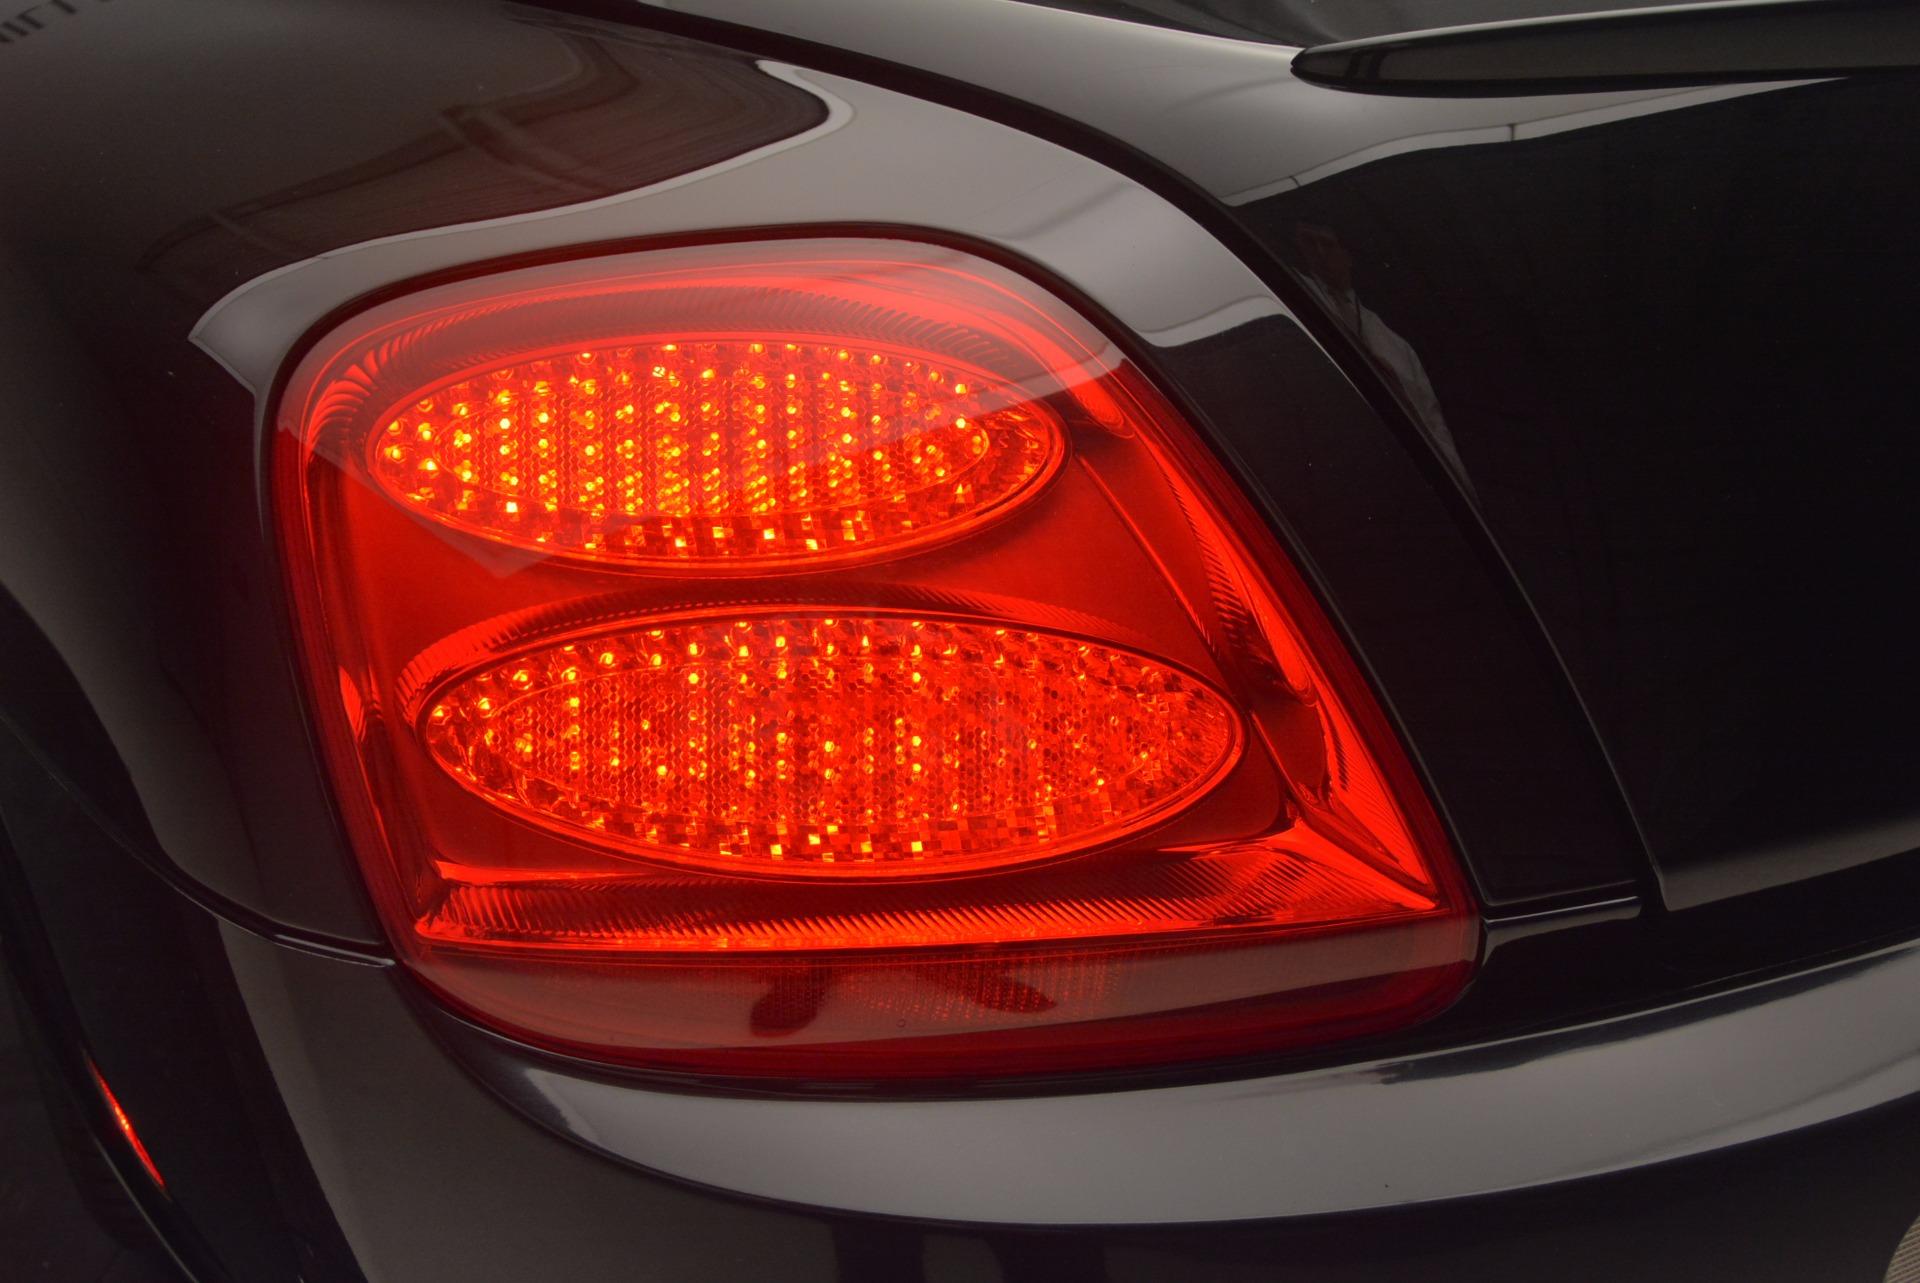 Used 2010 Bentley Continental GT Speed For Sale In Westport, CT 1298_p30